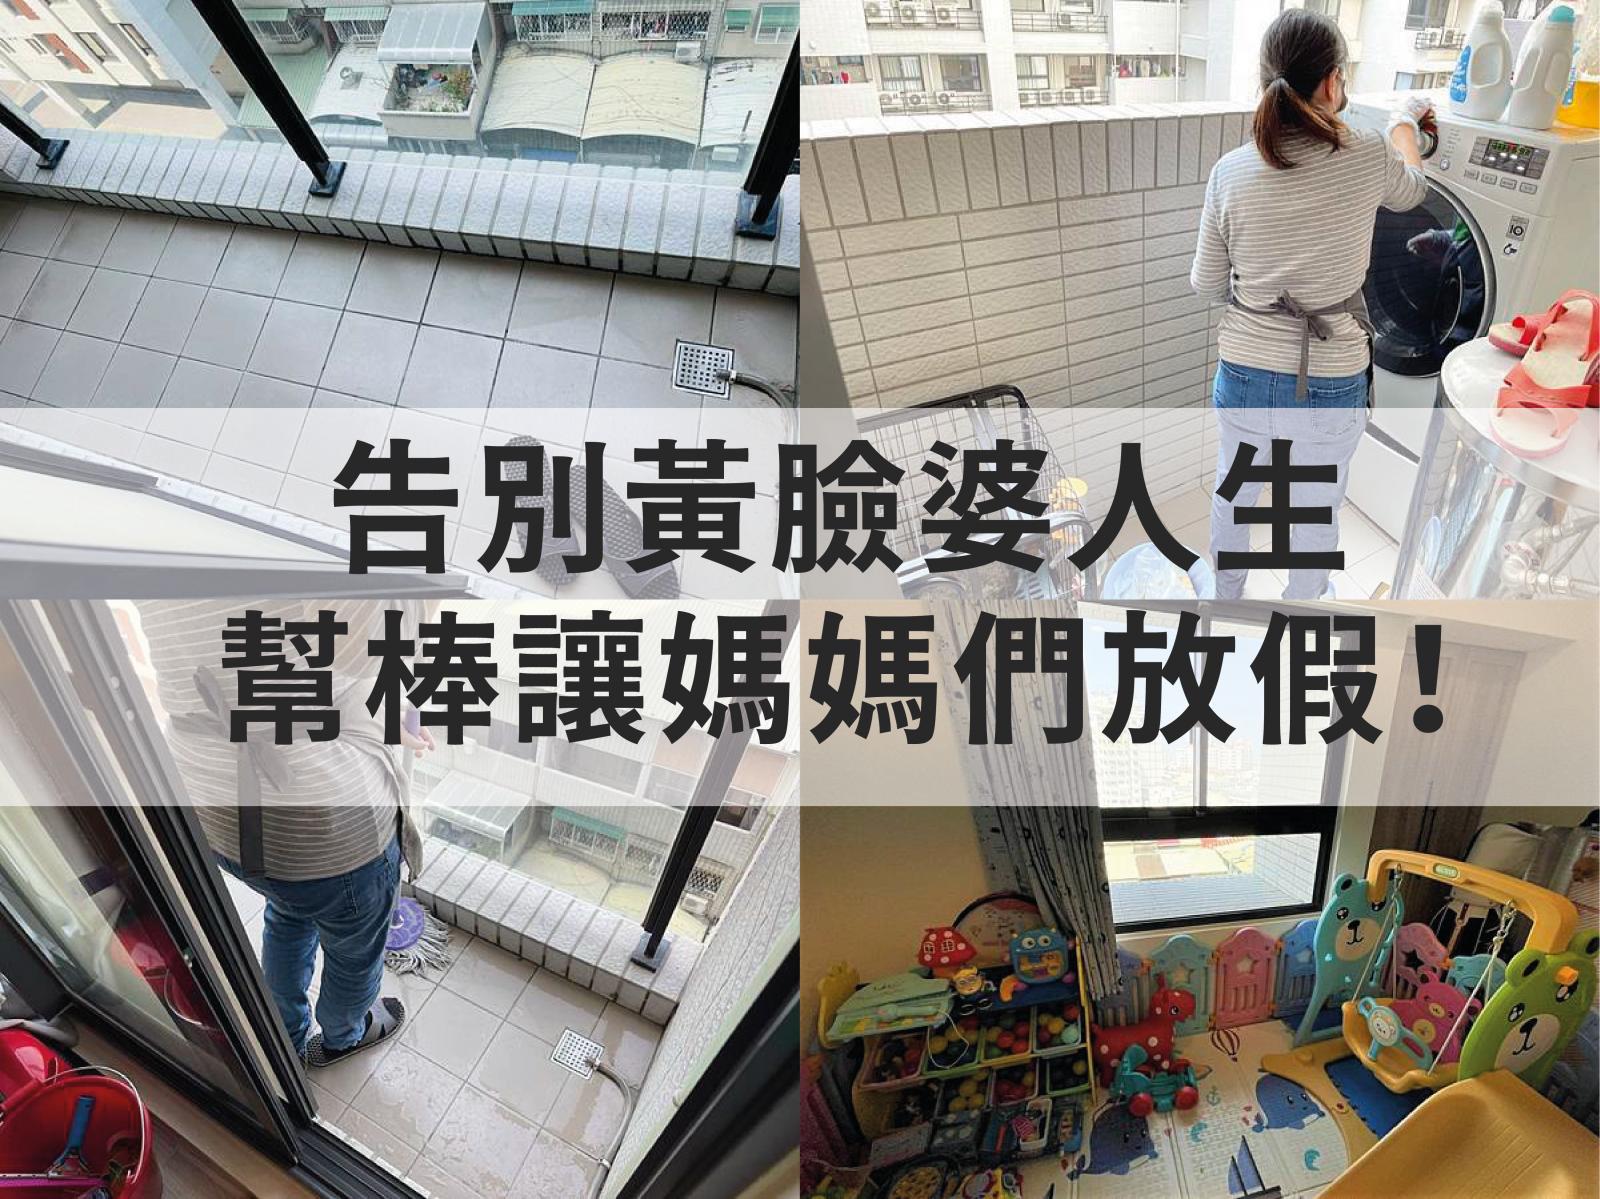 https://www.bounbang.com/blog/c445d860606bdde5.png